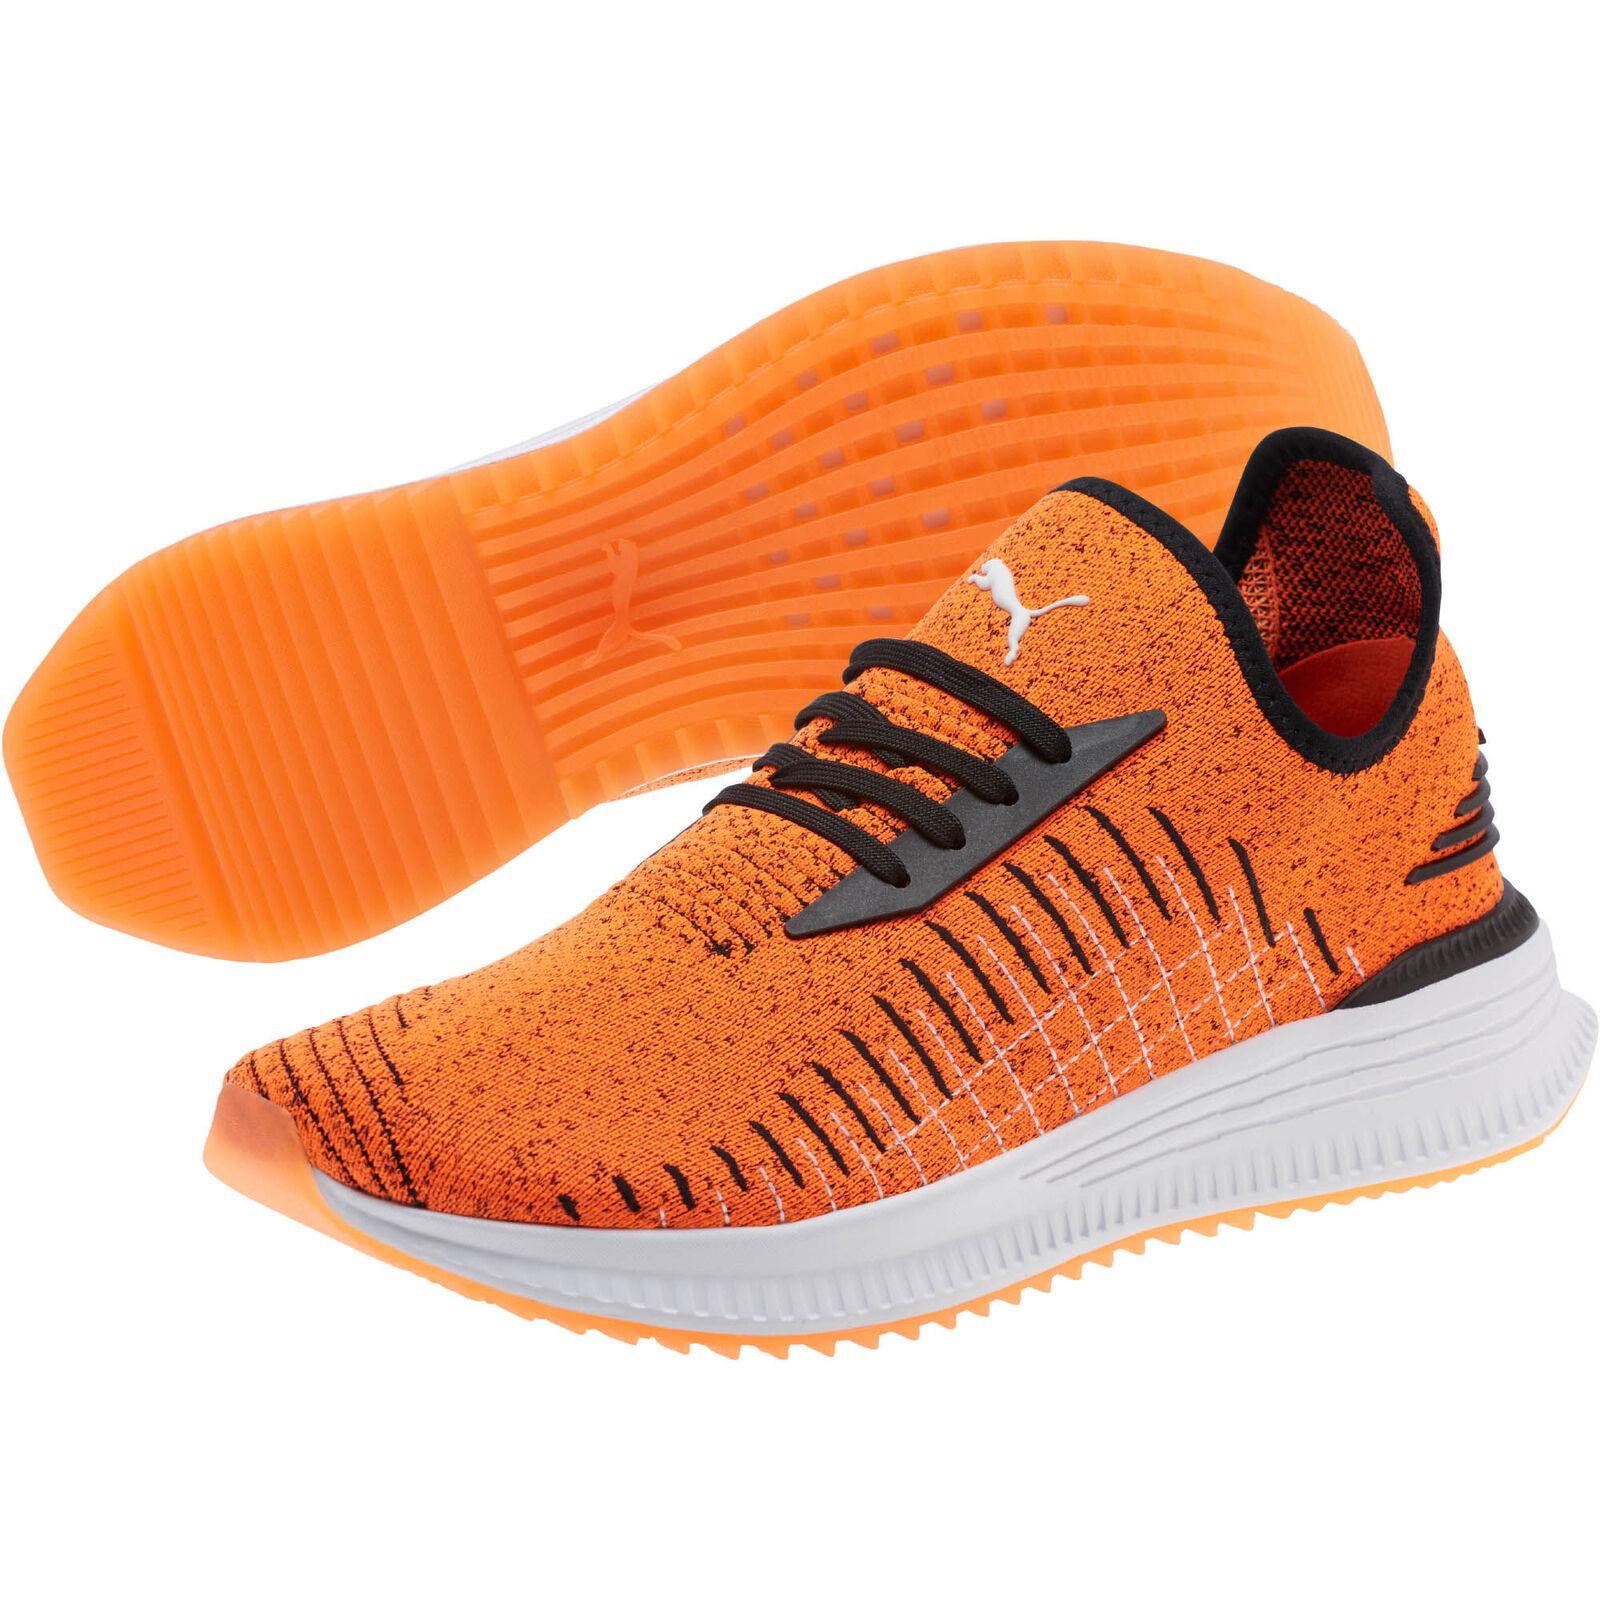 PUMA AVID Men's Sneakers Men Shoe Evolution New